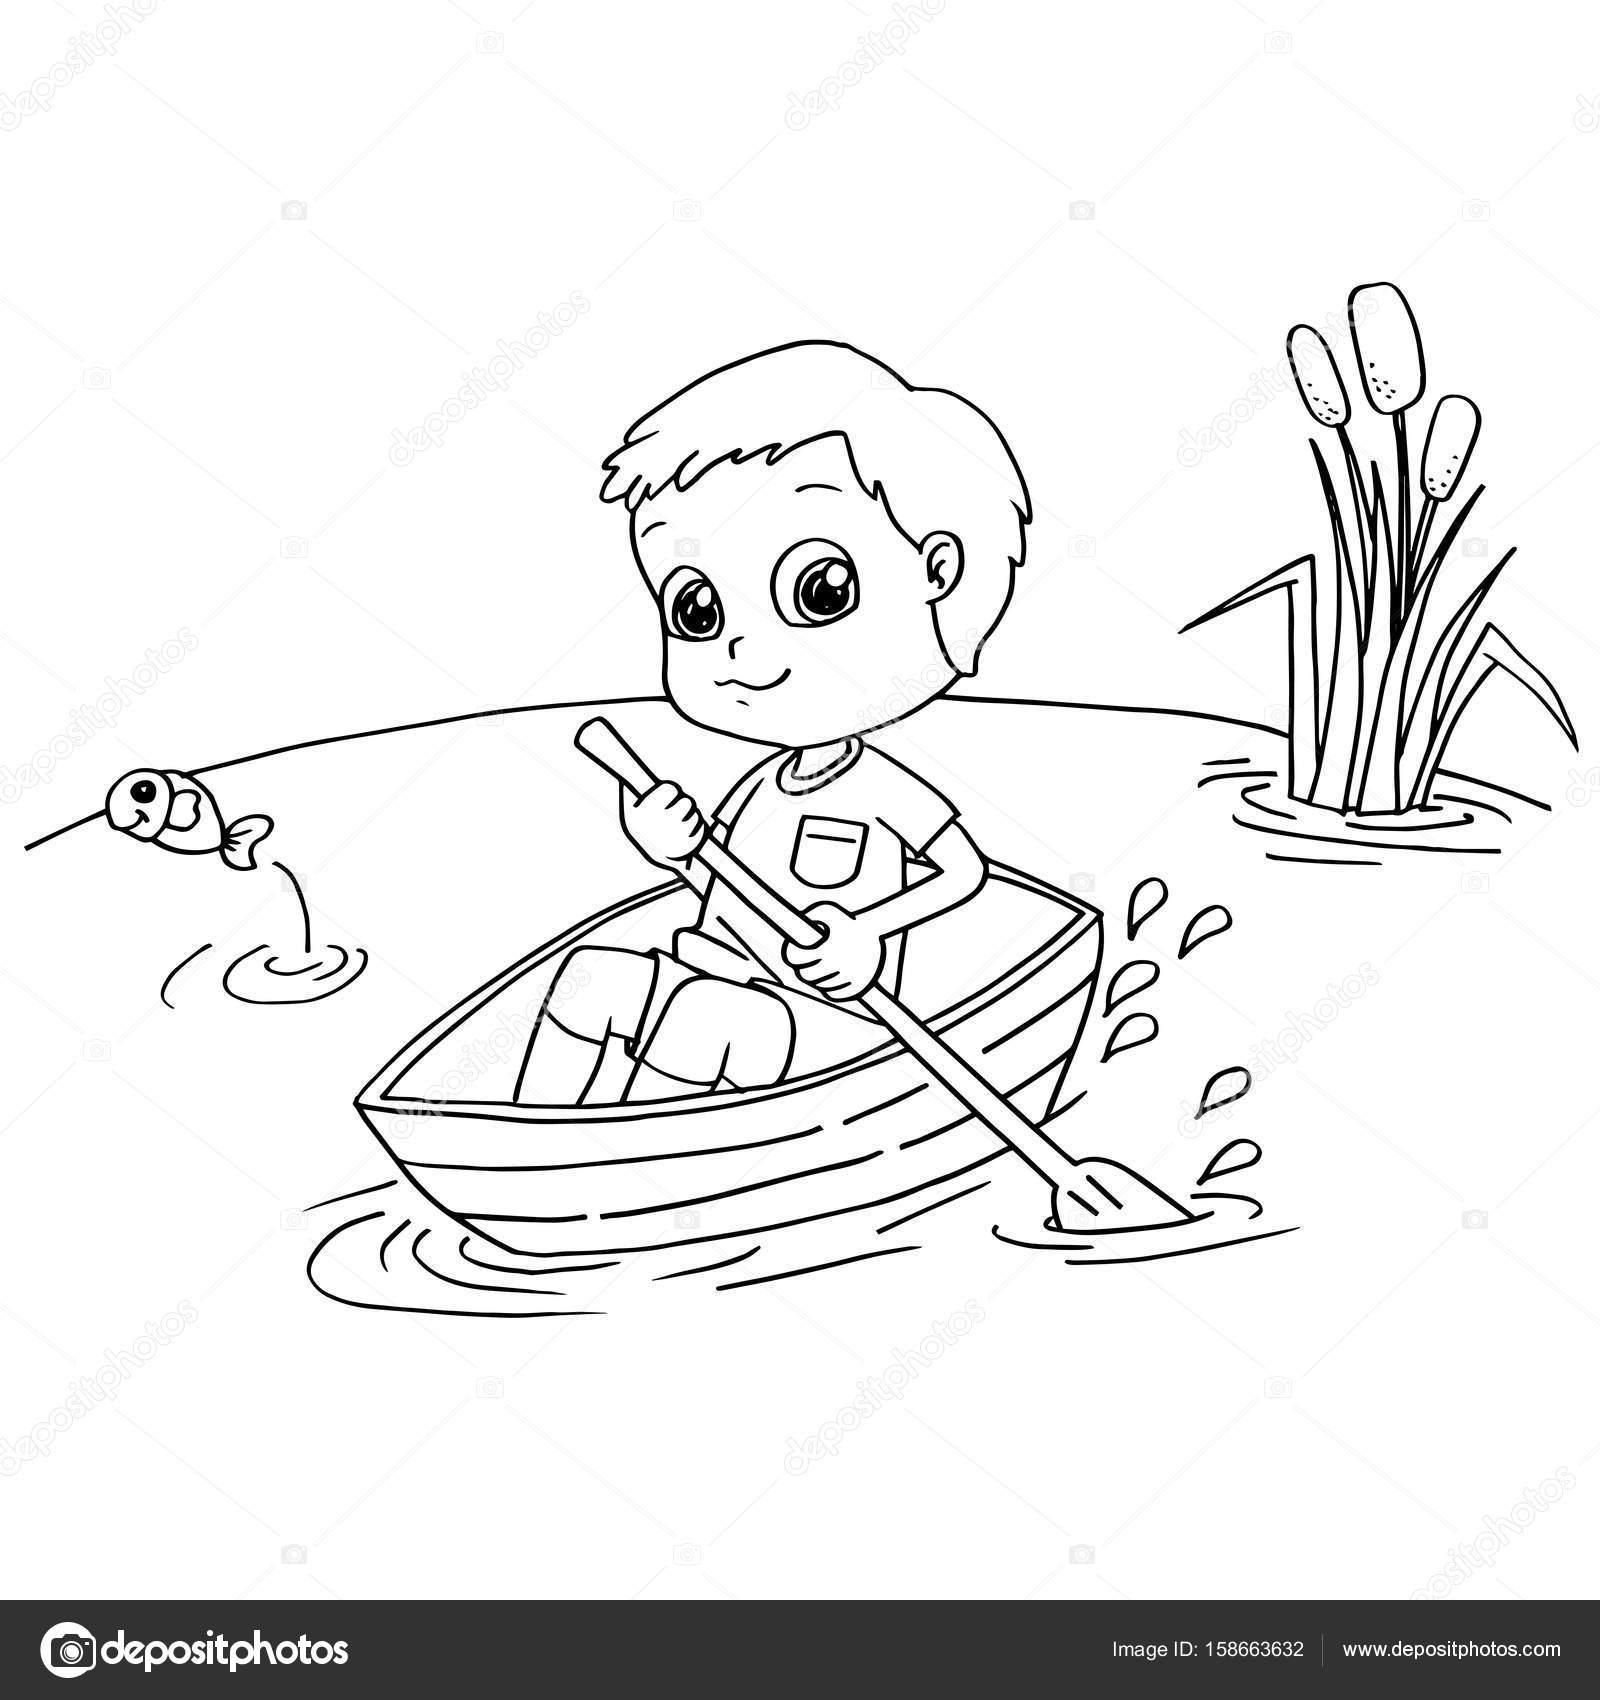 Rowing Boat Drawing At Getdrawings